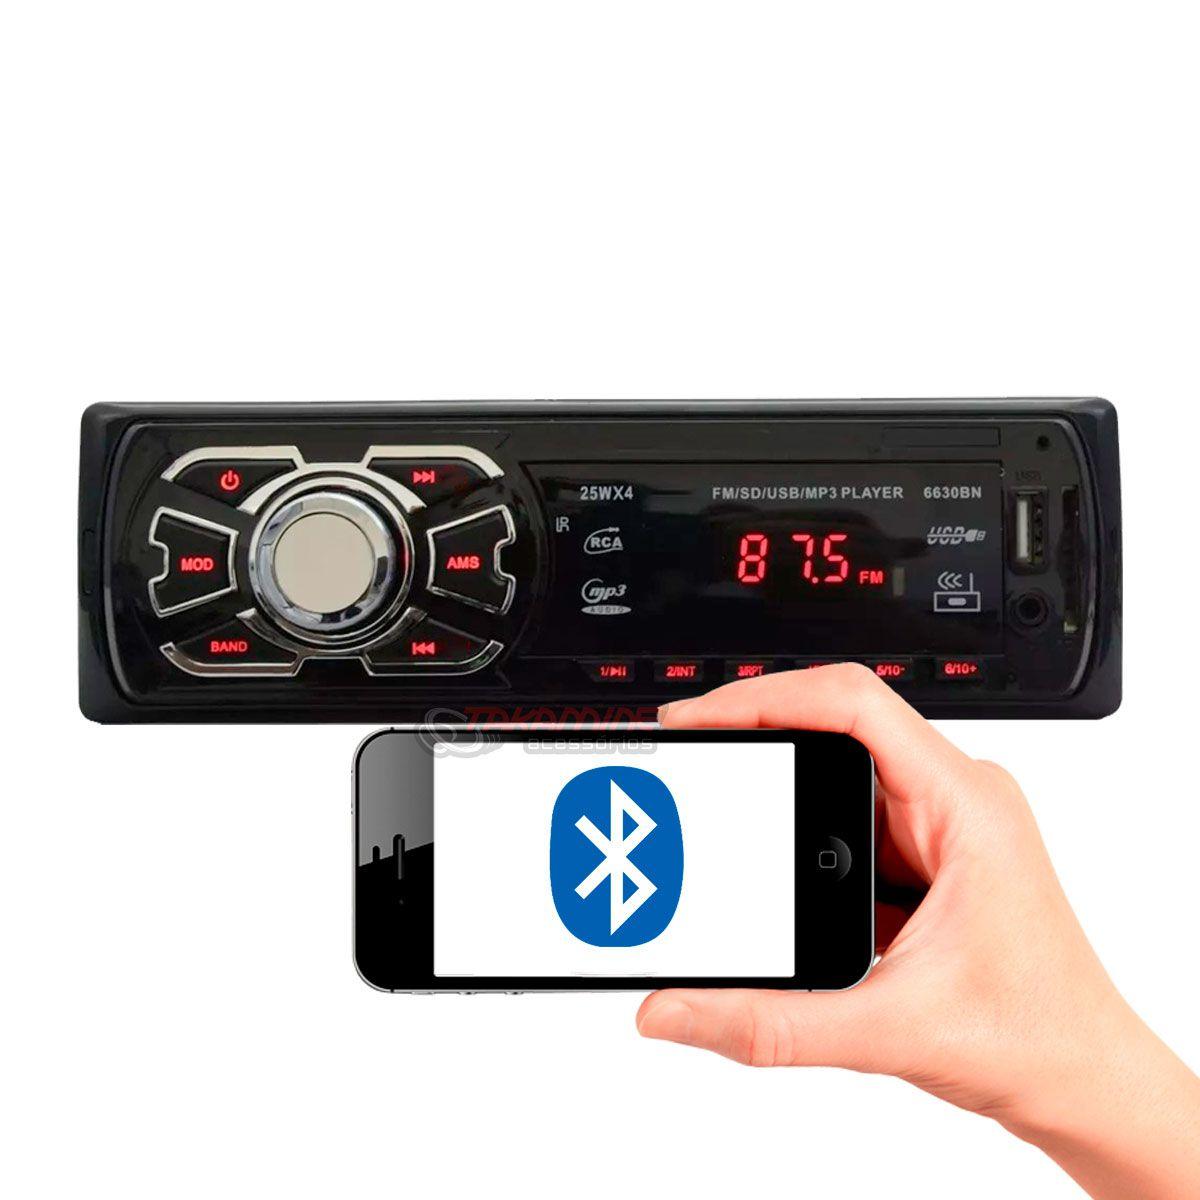 MP3 automotivo Ruchi com bluetooth entrada USB SD AUX AM FM Display LED